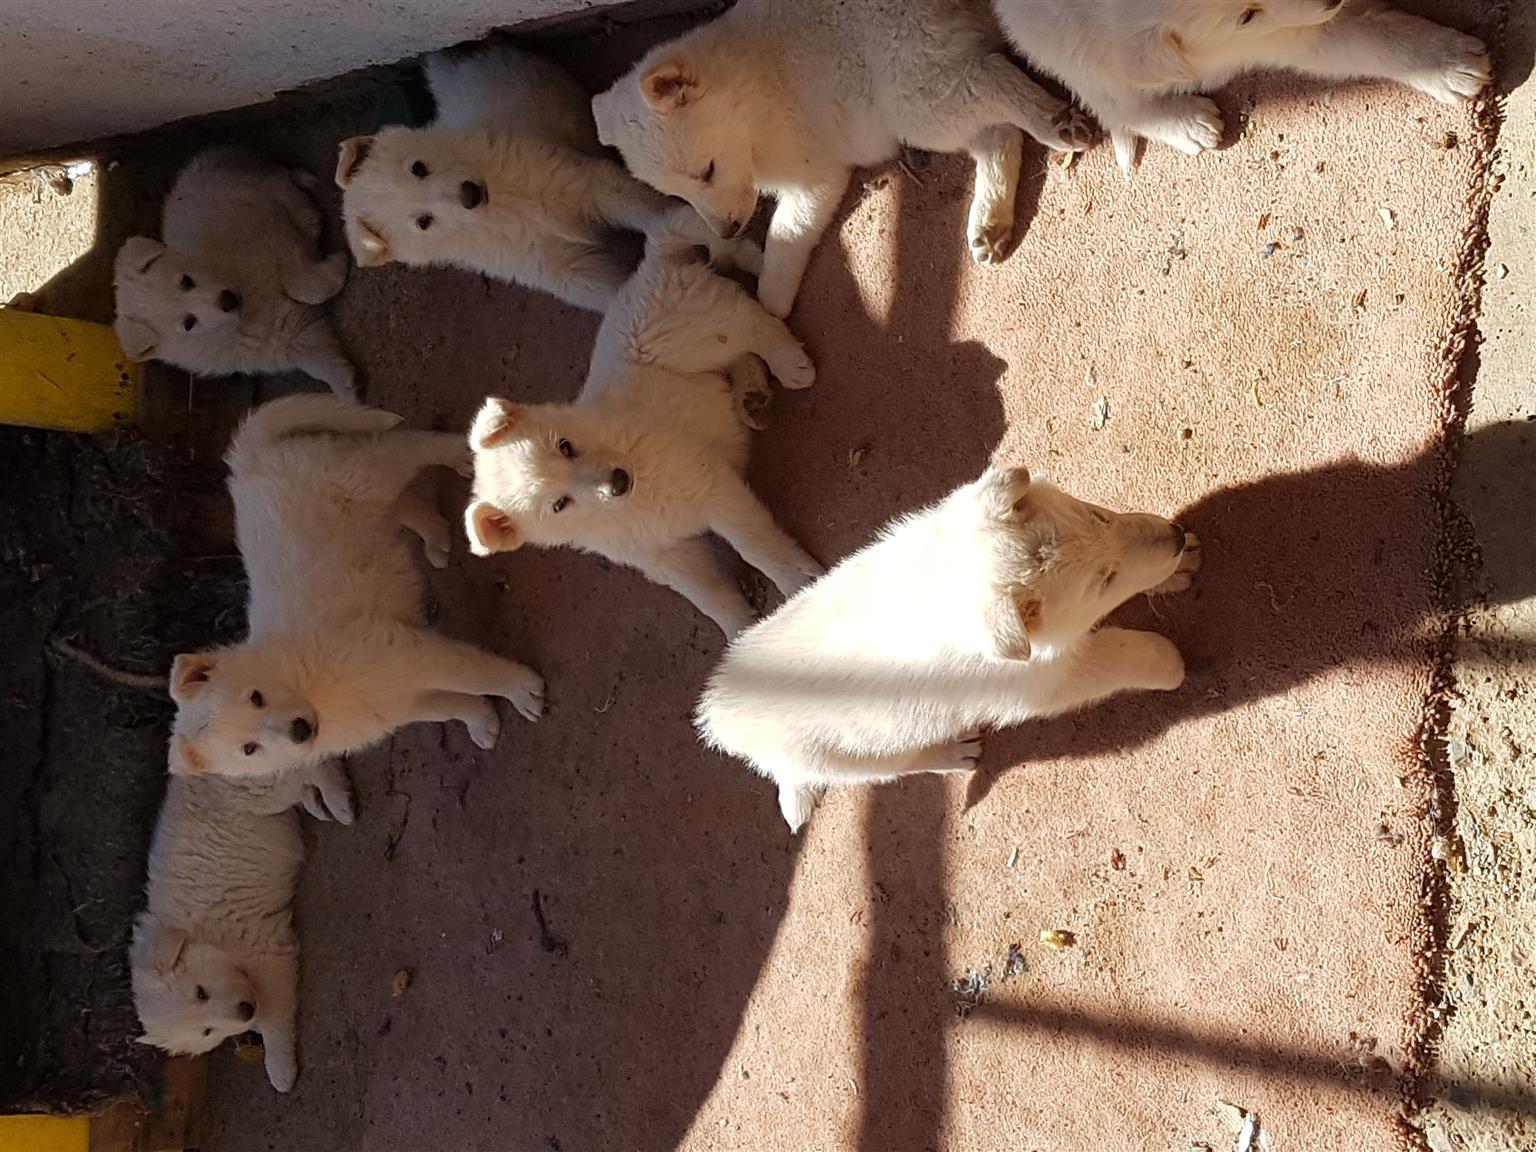 Swiss Shepherd Puppies for Sale born 06/12/2019